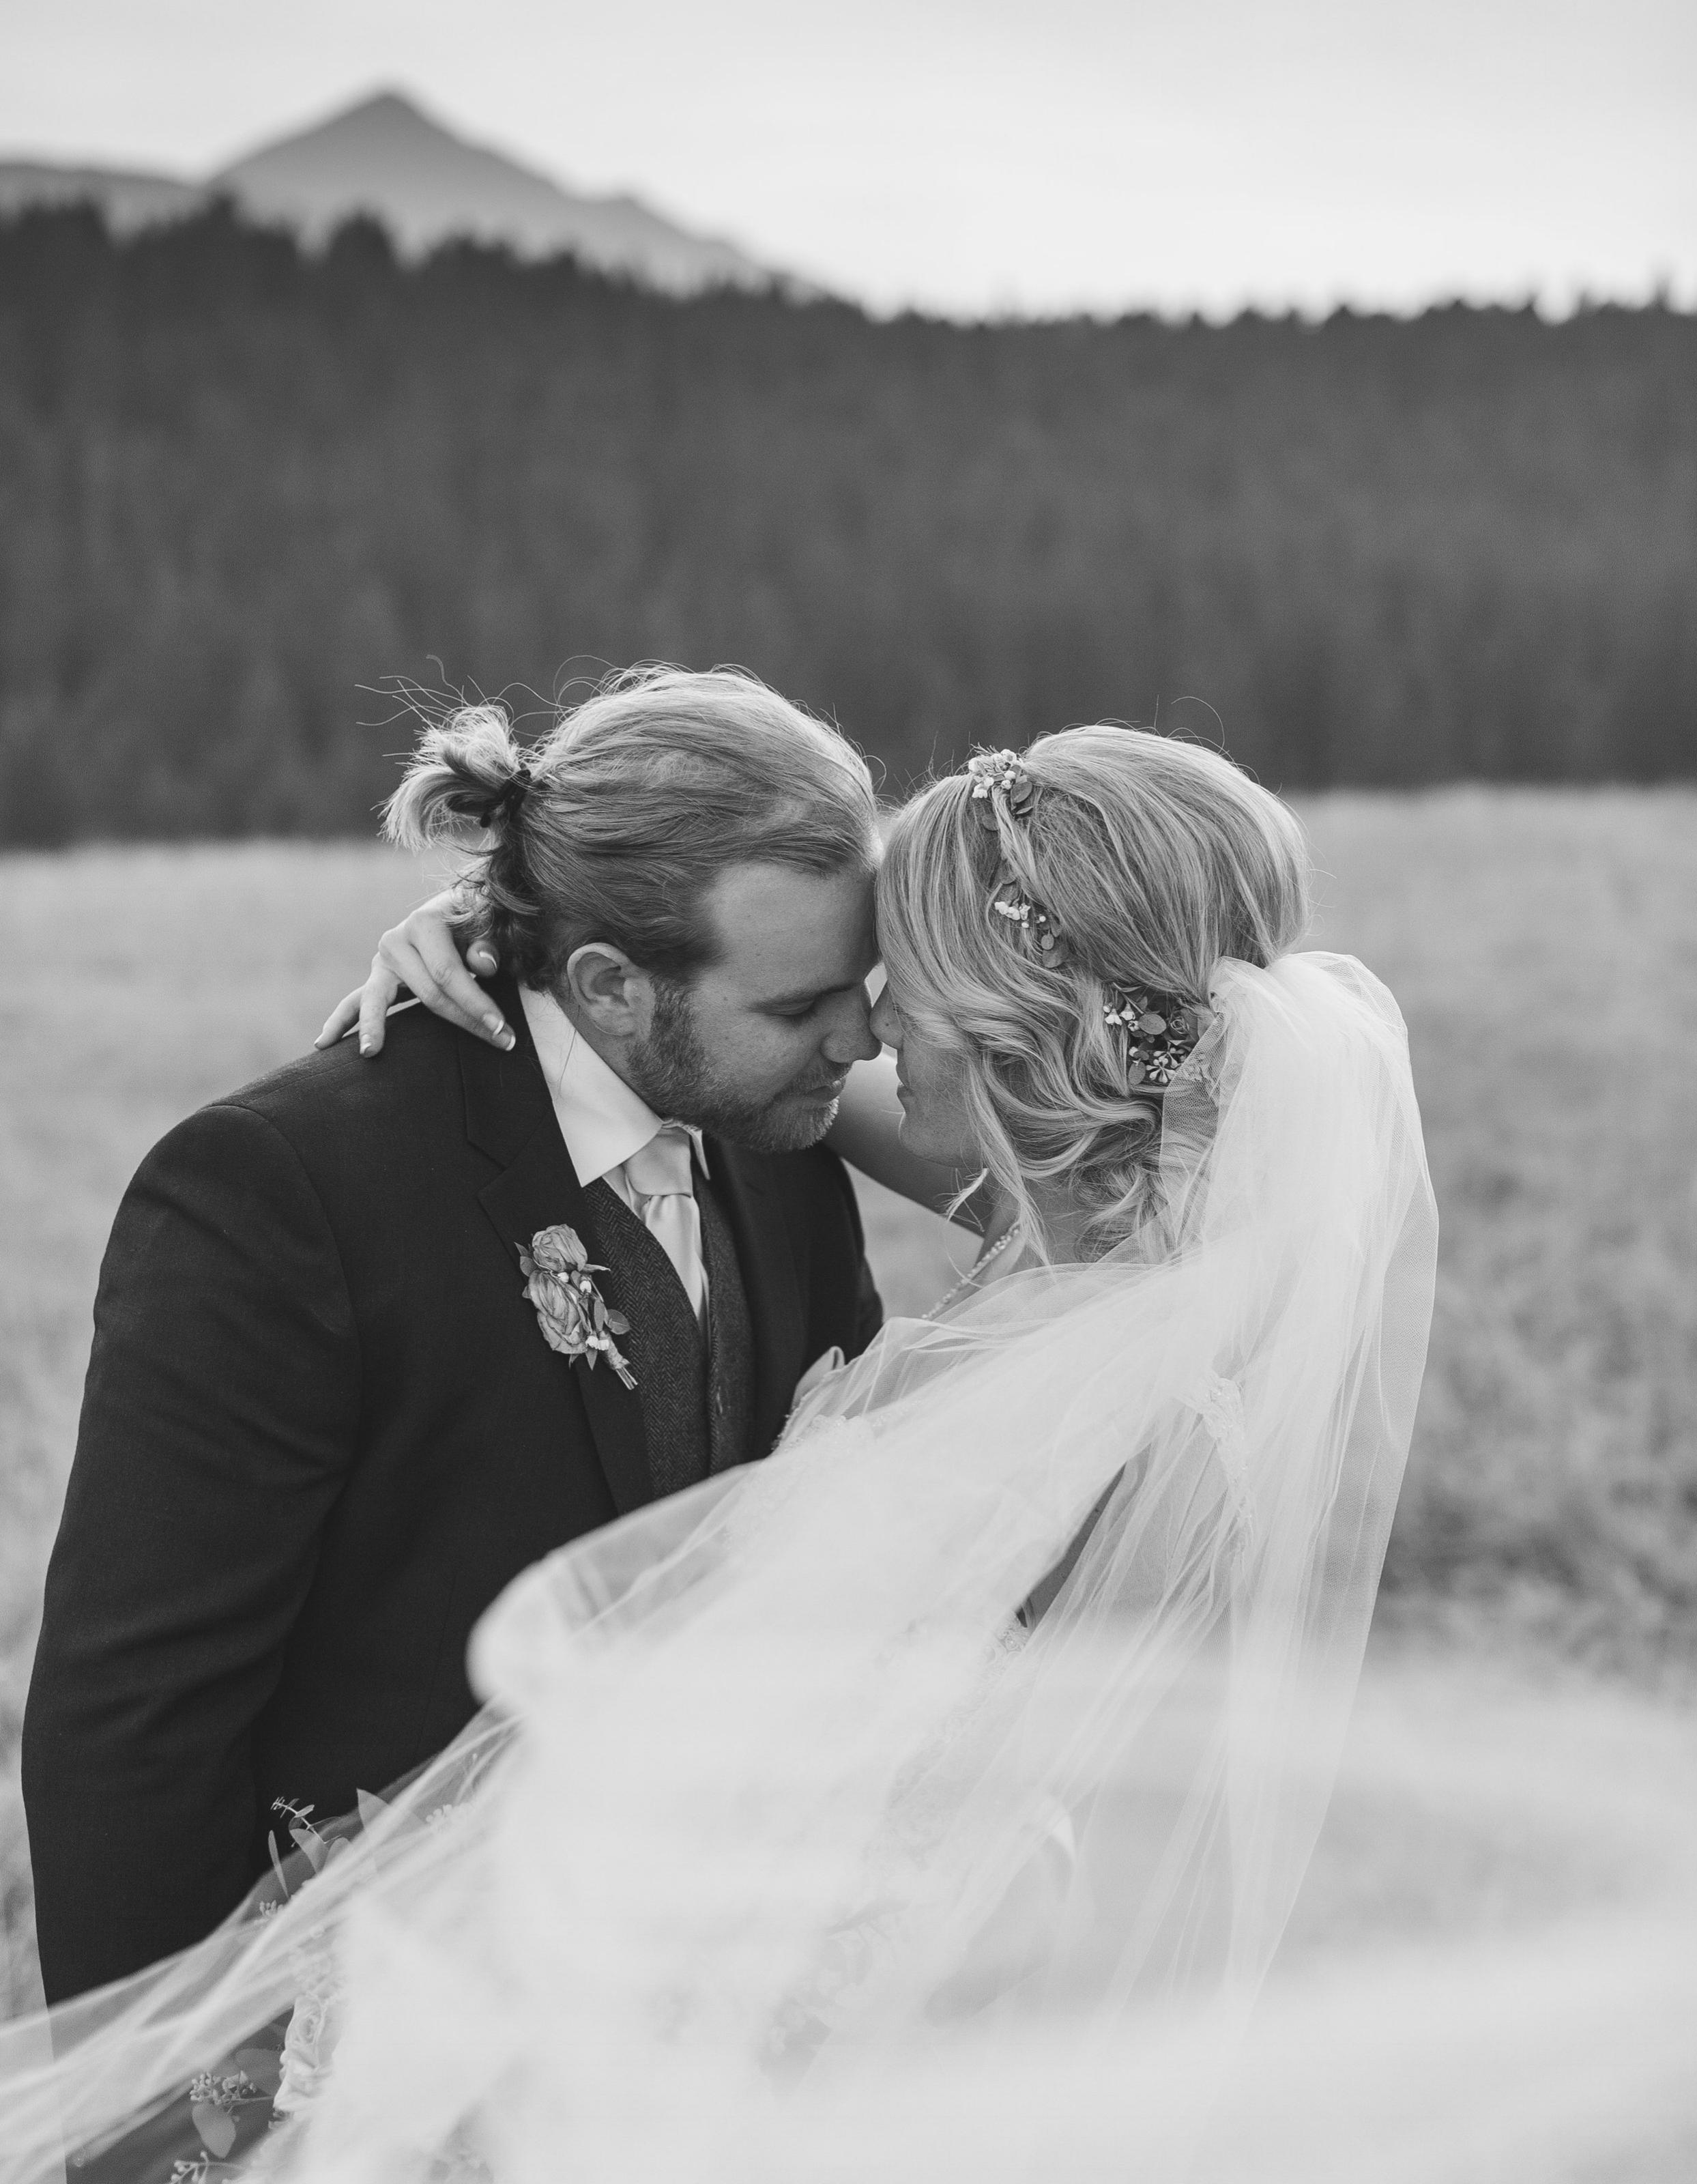 Big Sky Montana wedding bride and groom with mountains